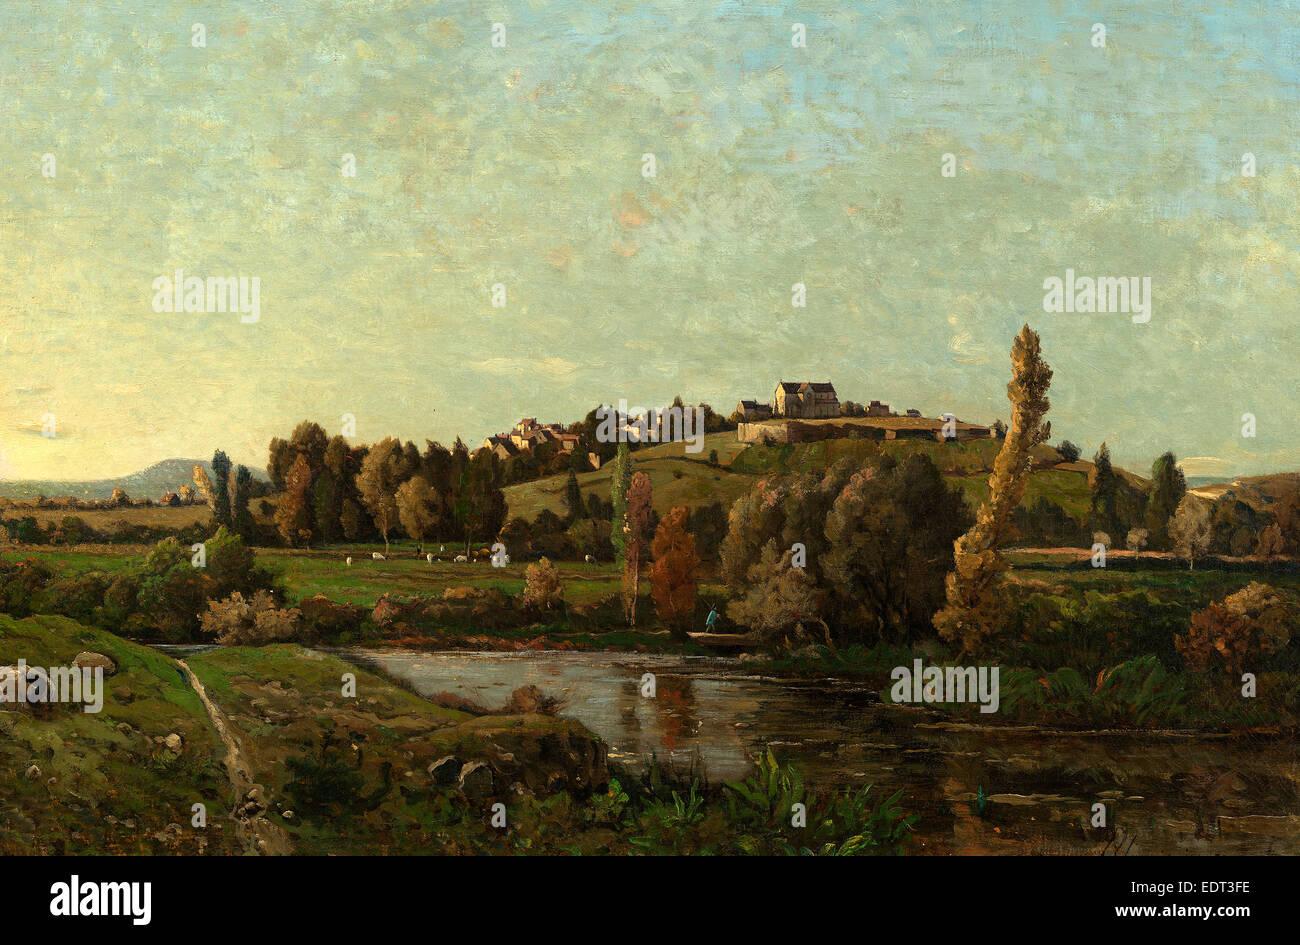 Henri-Joseph Harpignies (French, 1819 - 1916), Landscape in Auvergne, 1870, oil on canvas - Stock Image